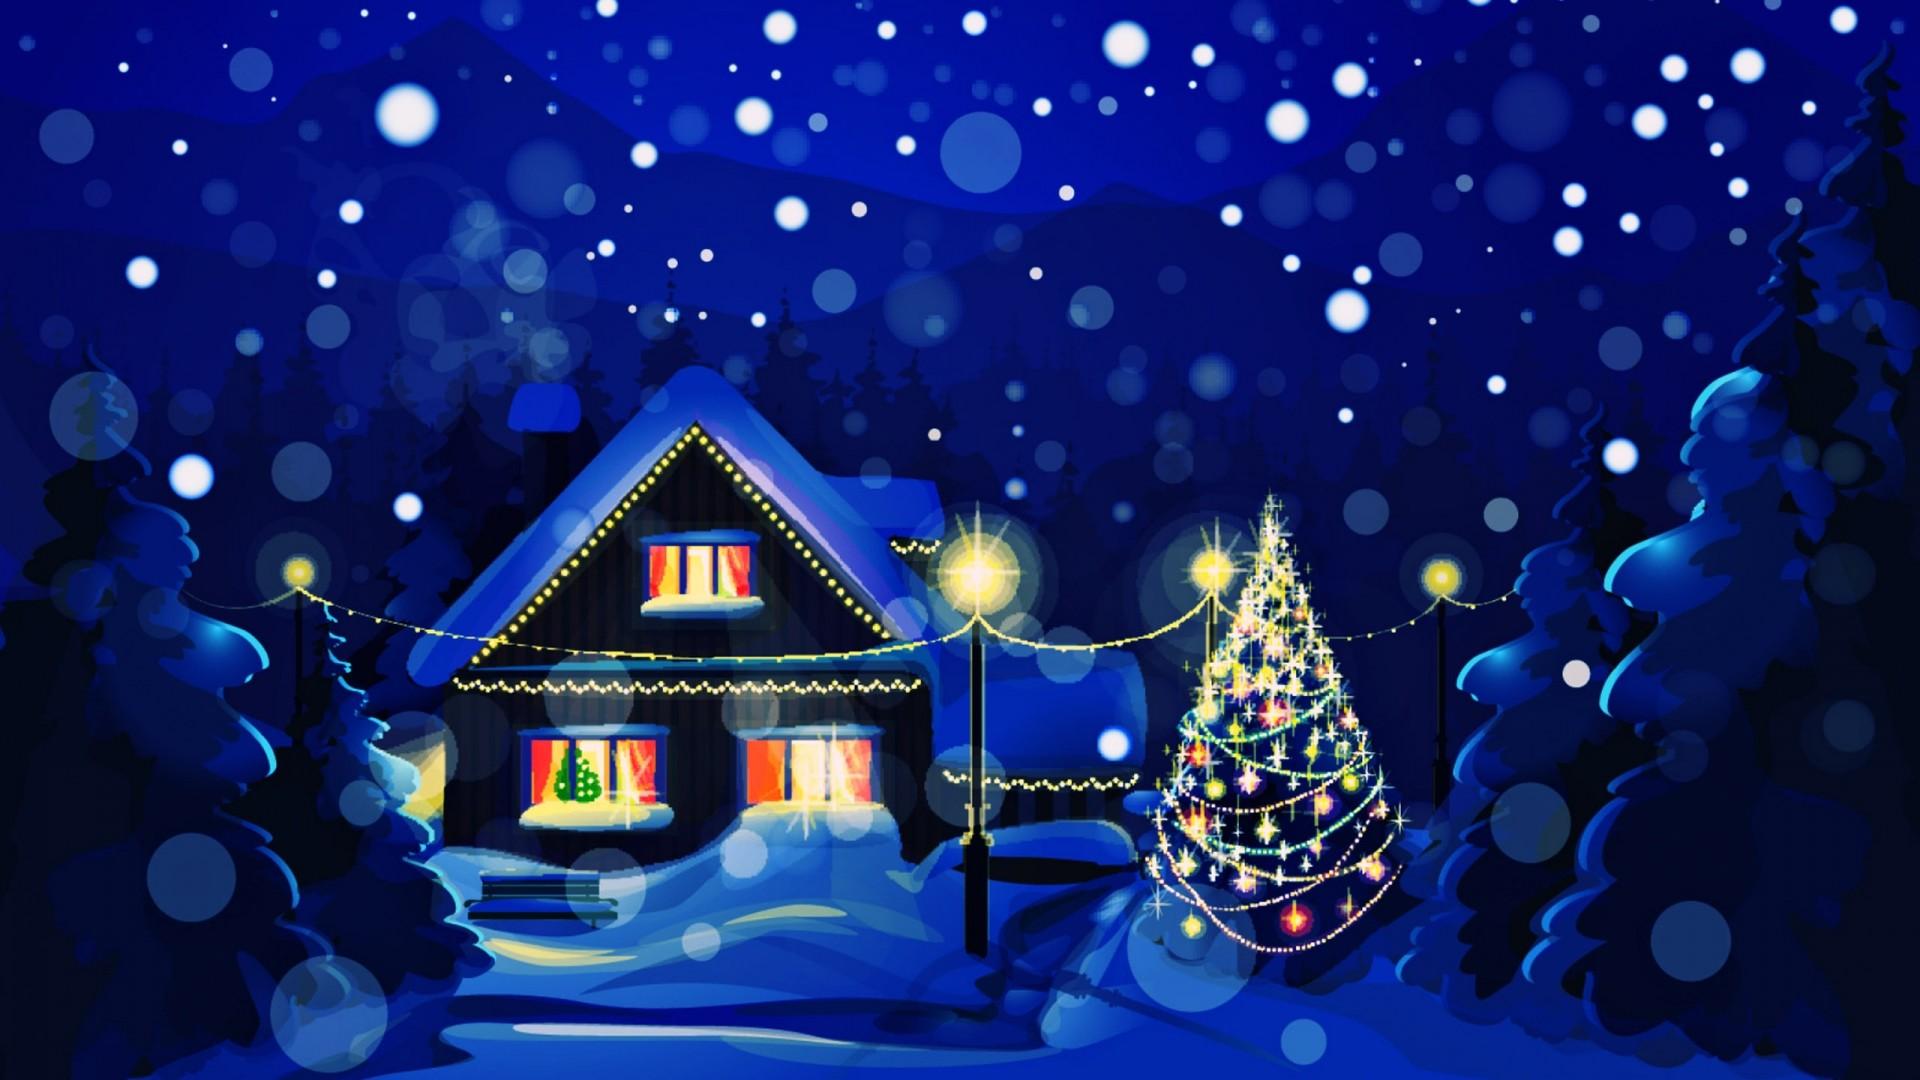 free-merry-christmas-image